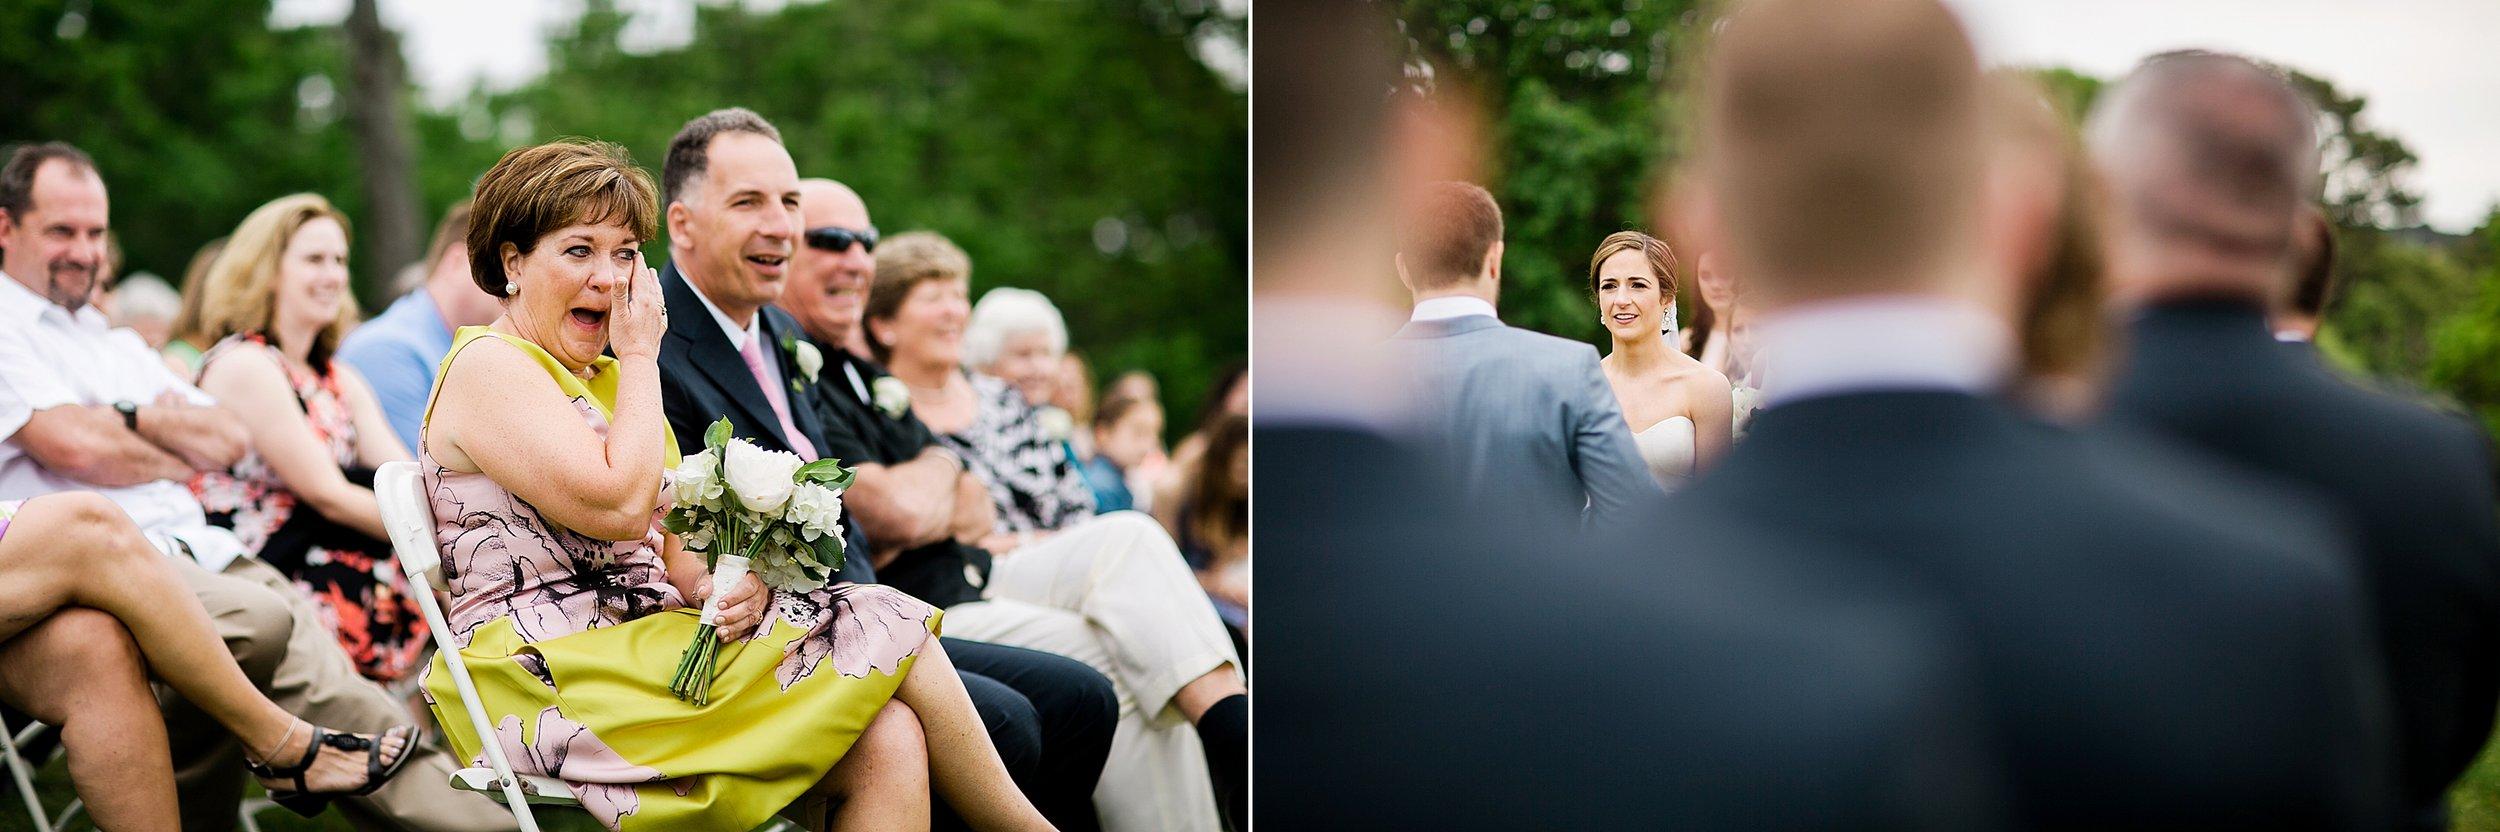 036 los angeles wedding photographer todd danforth photography cape cod.jpg